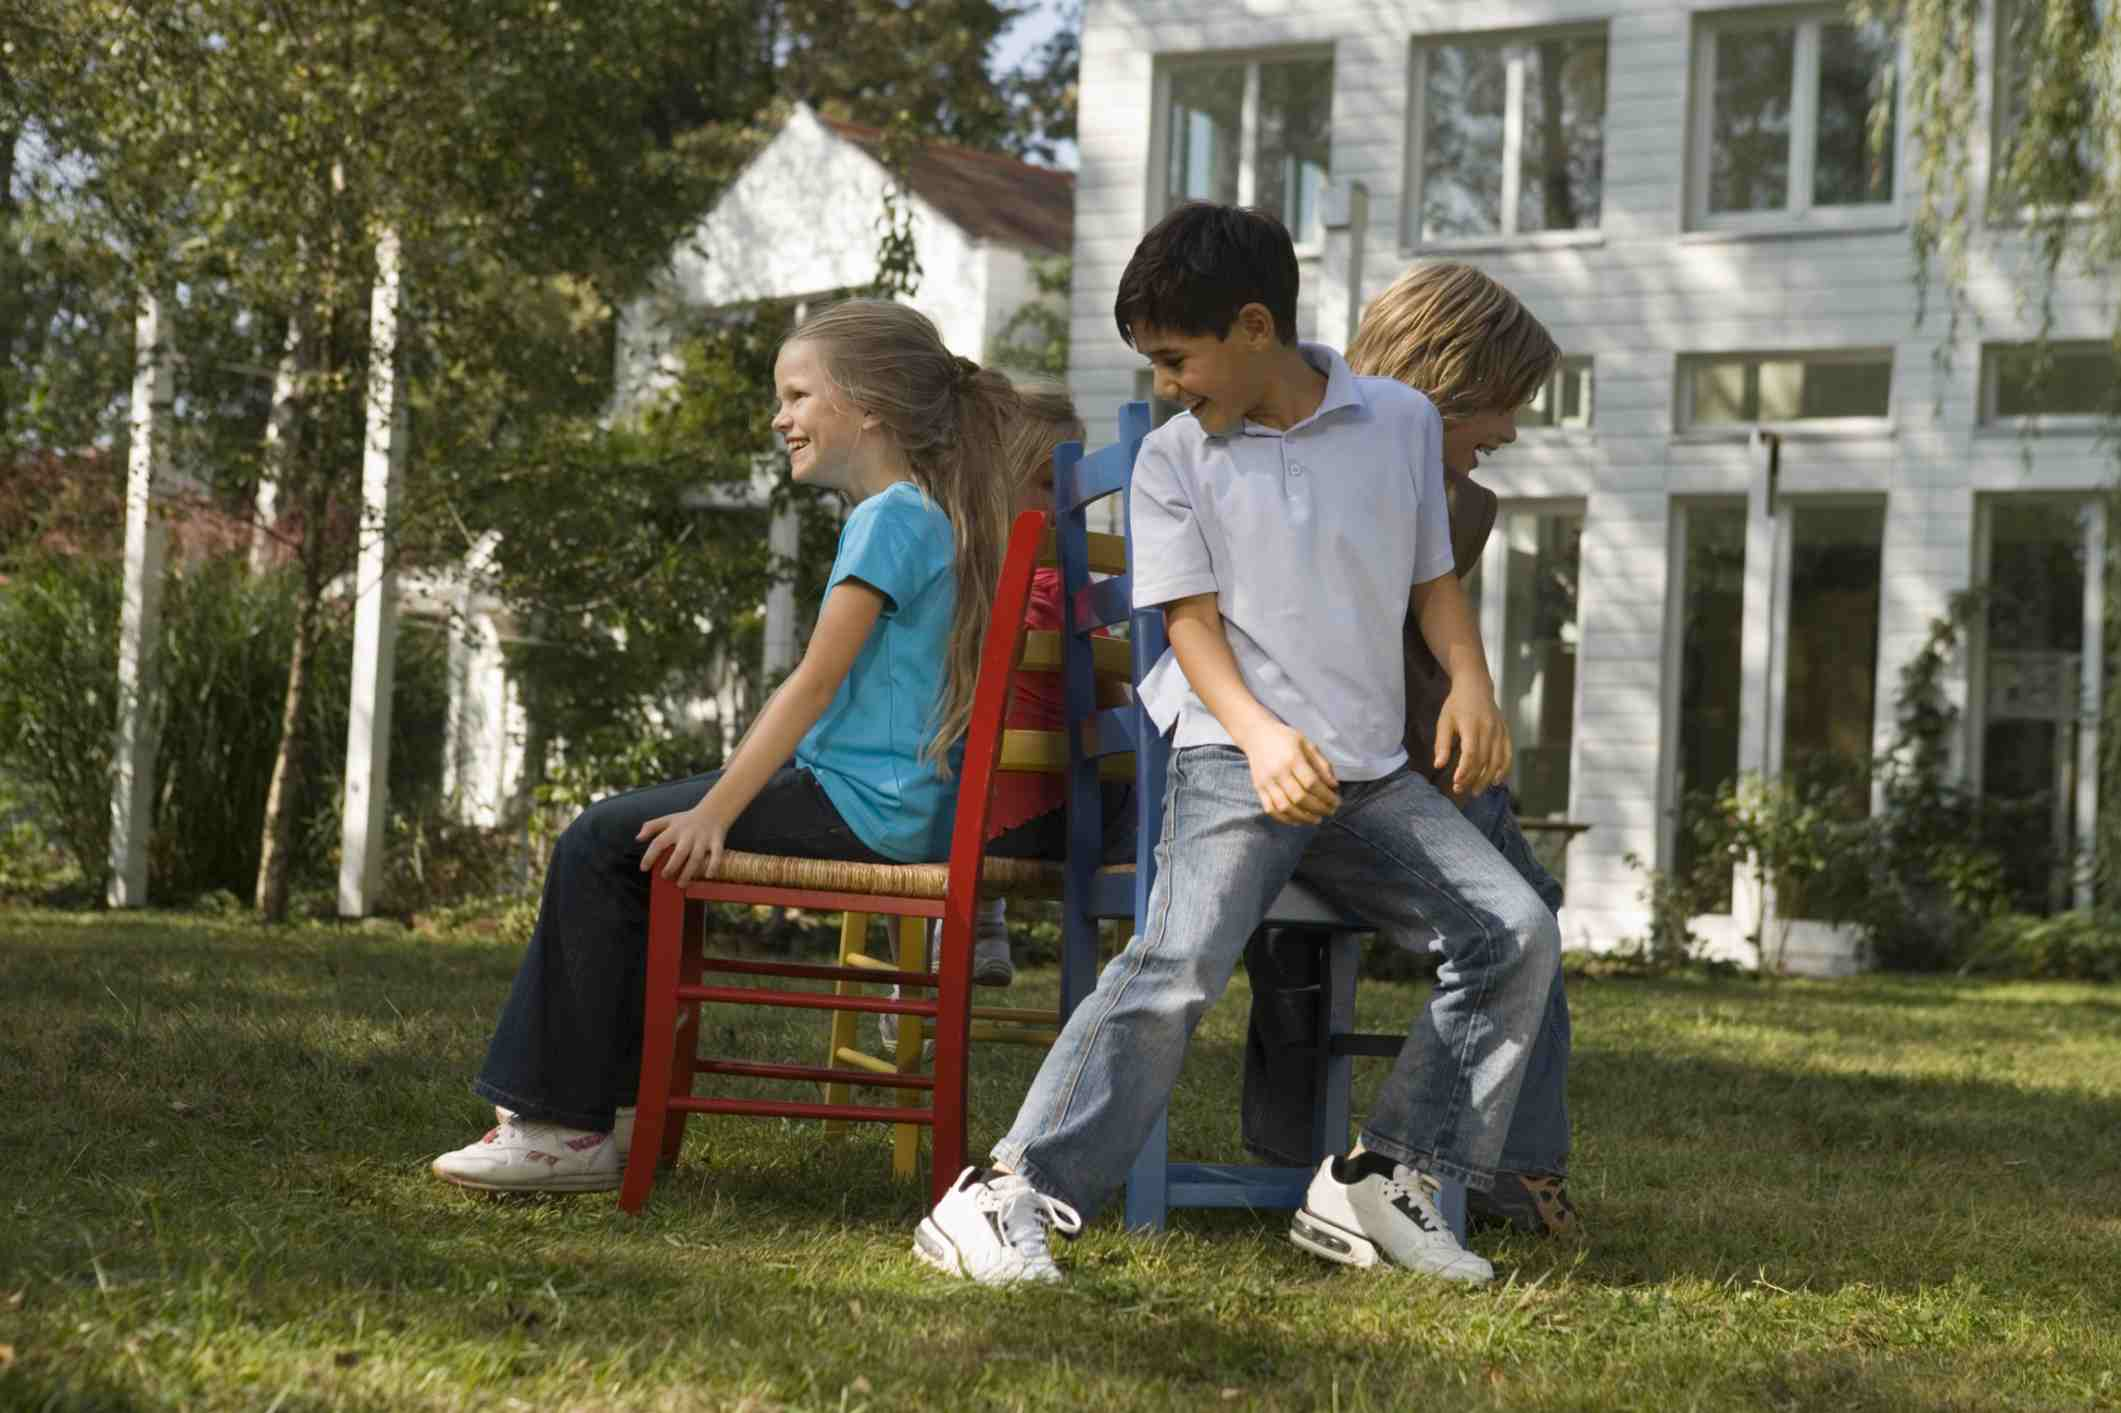 Un grupo de niños tocando sillas musicales